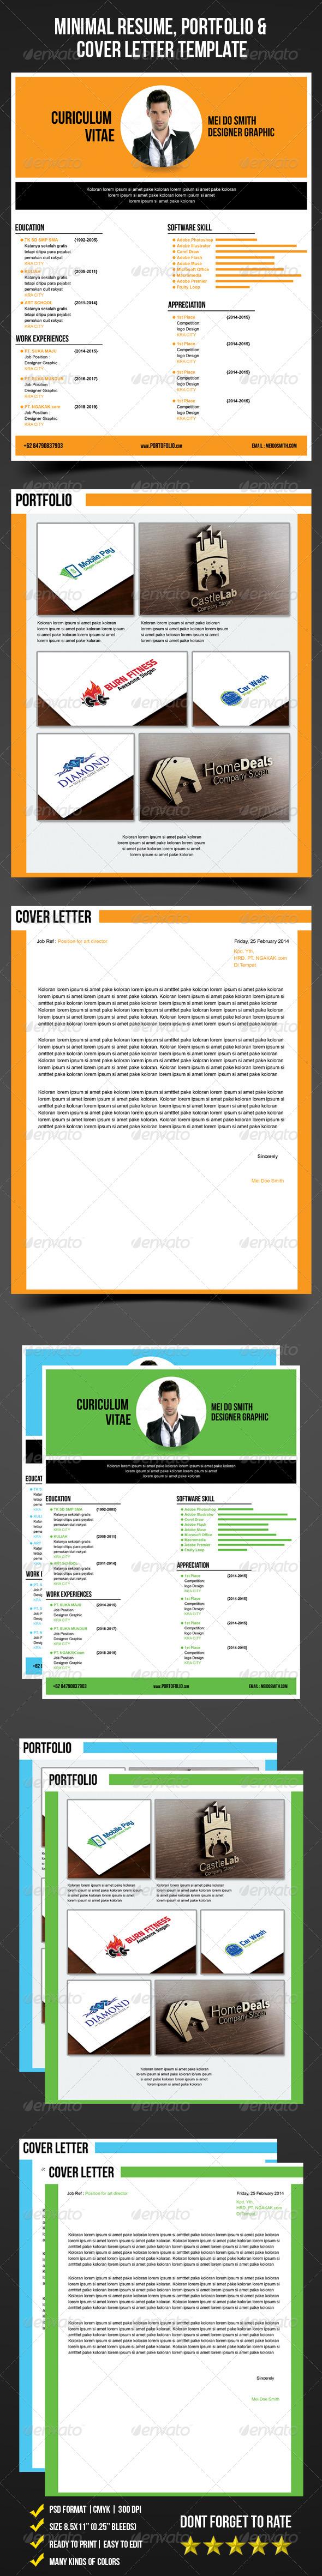 Minimal Resume, Portfolio & Cover Letter Template